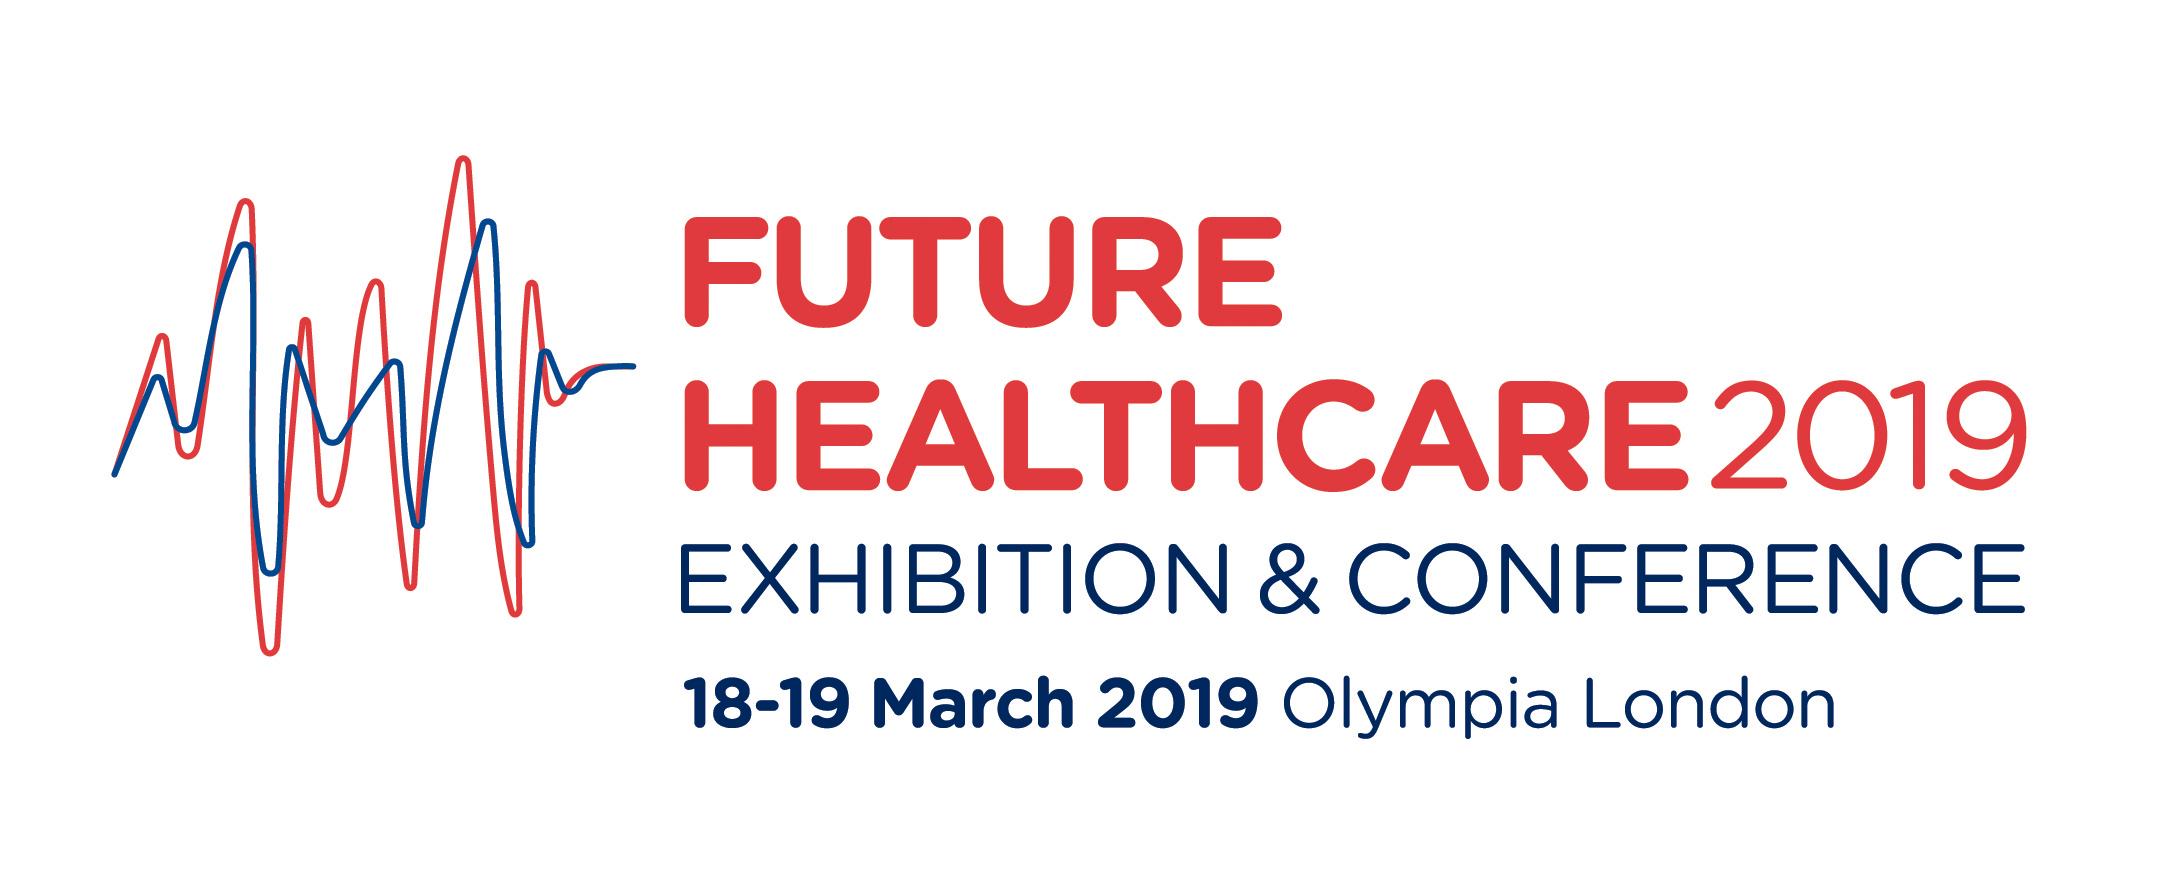 Future Healthcare 2019 logo.jpg